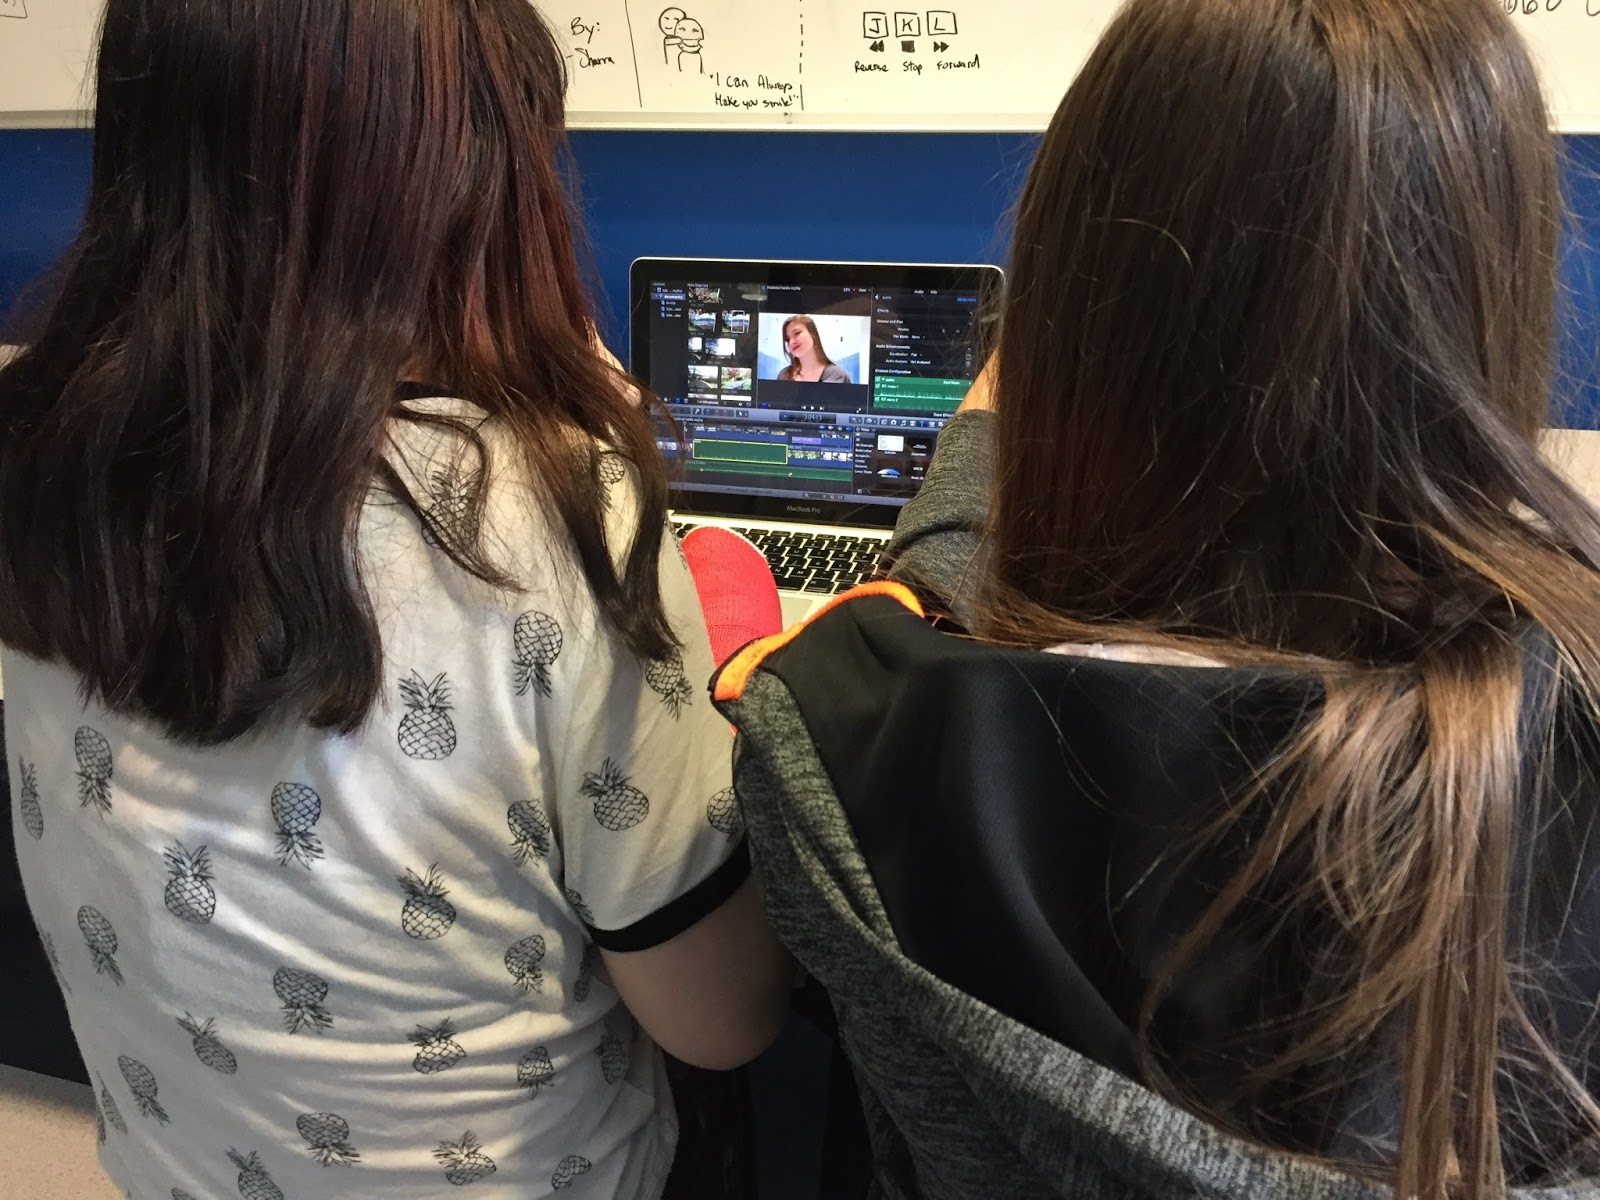 2/3 of the team (Tyra and Tasharra) caught editing!